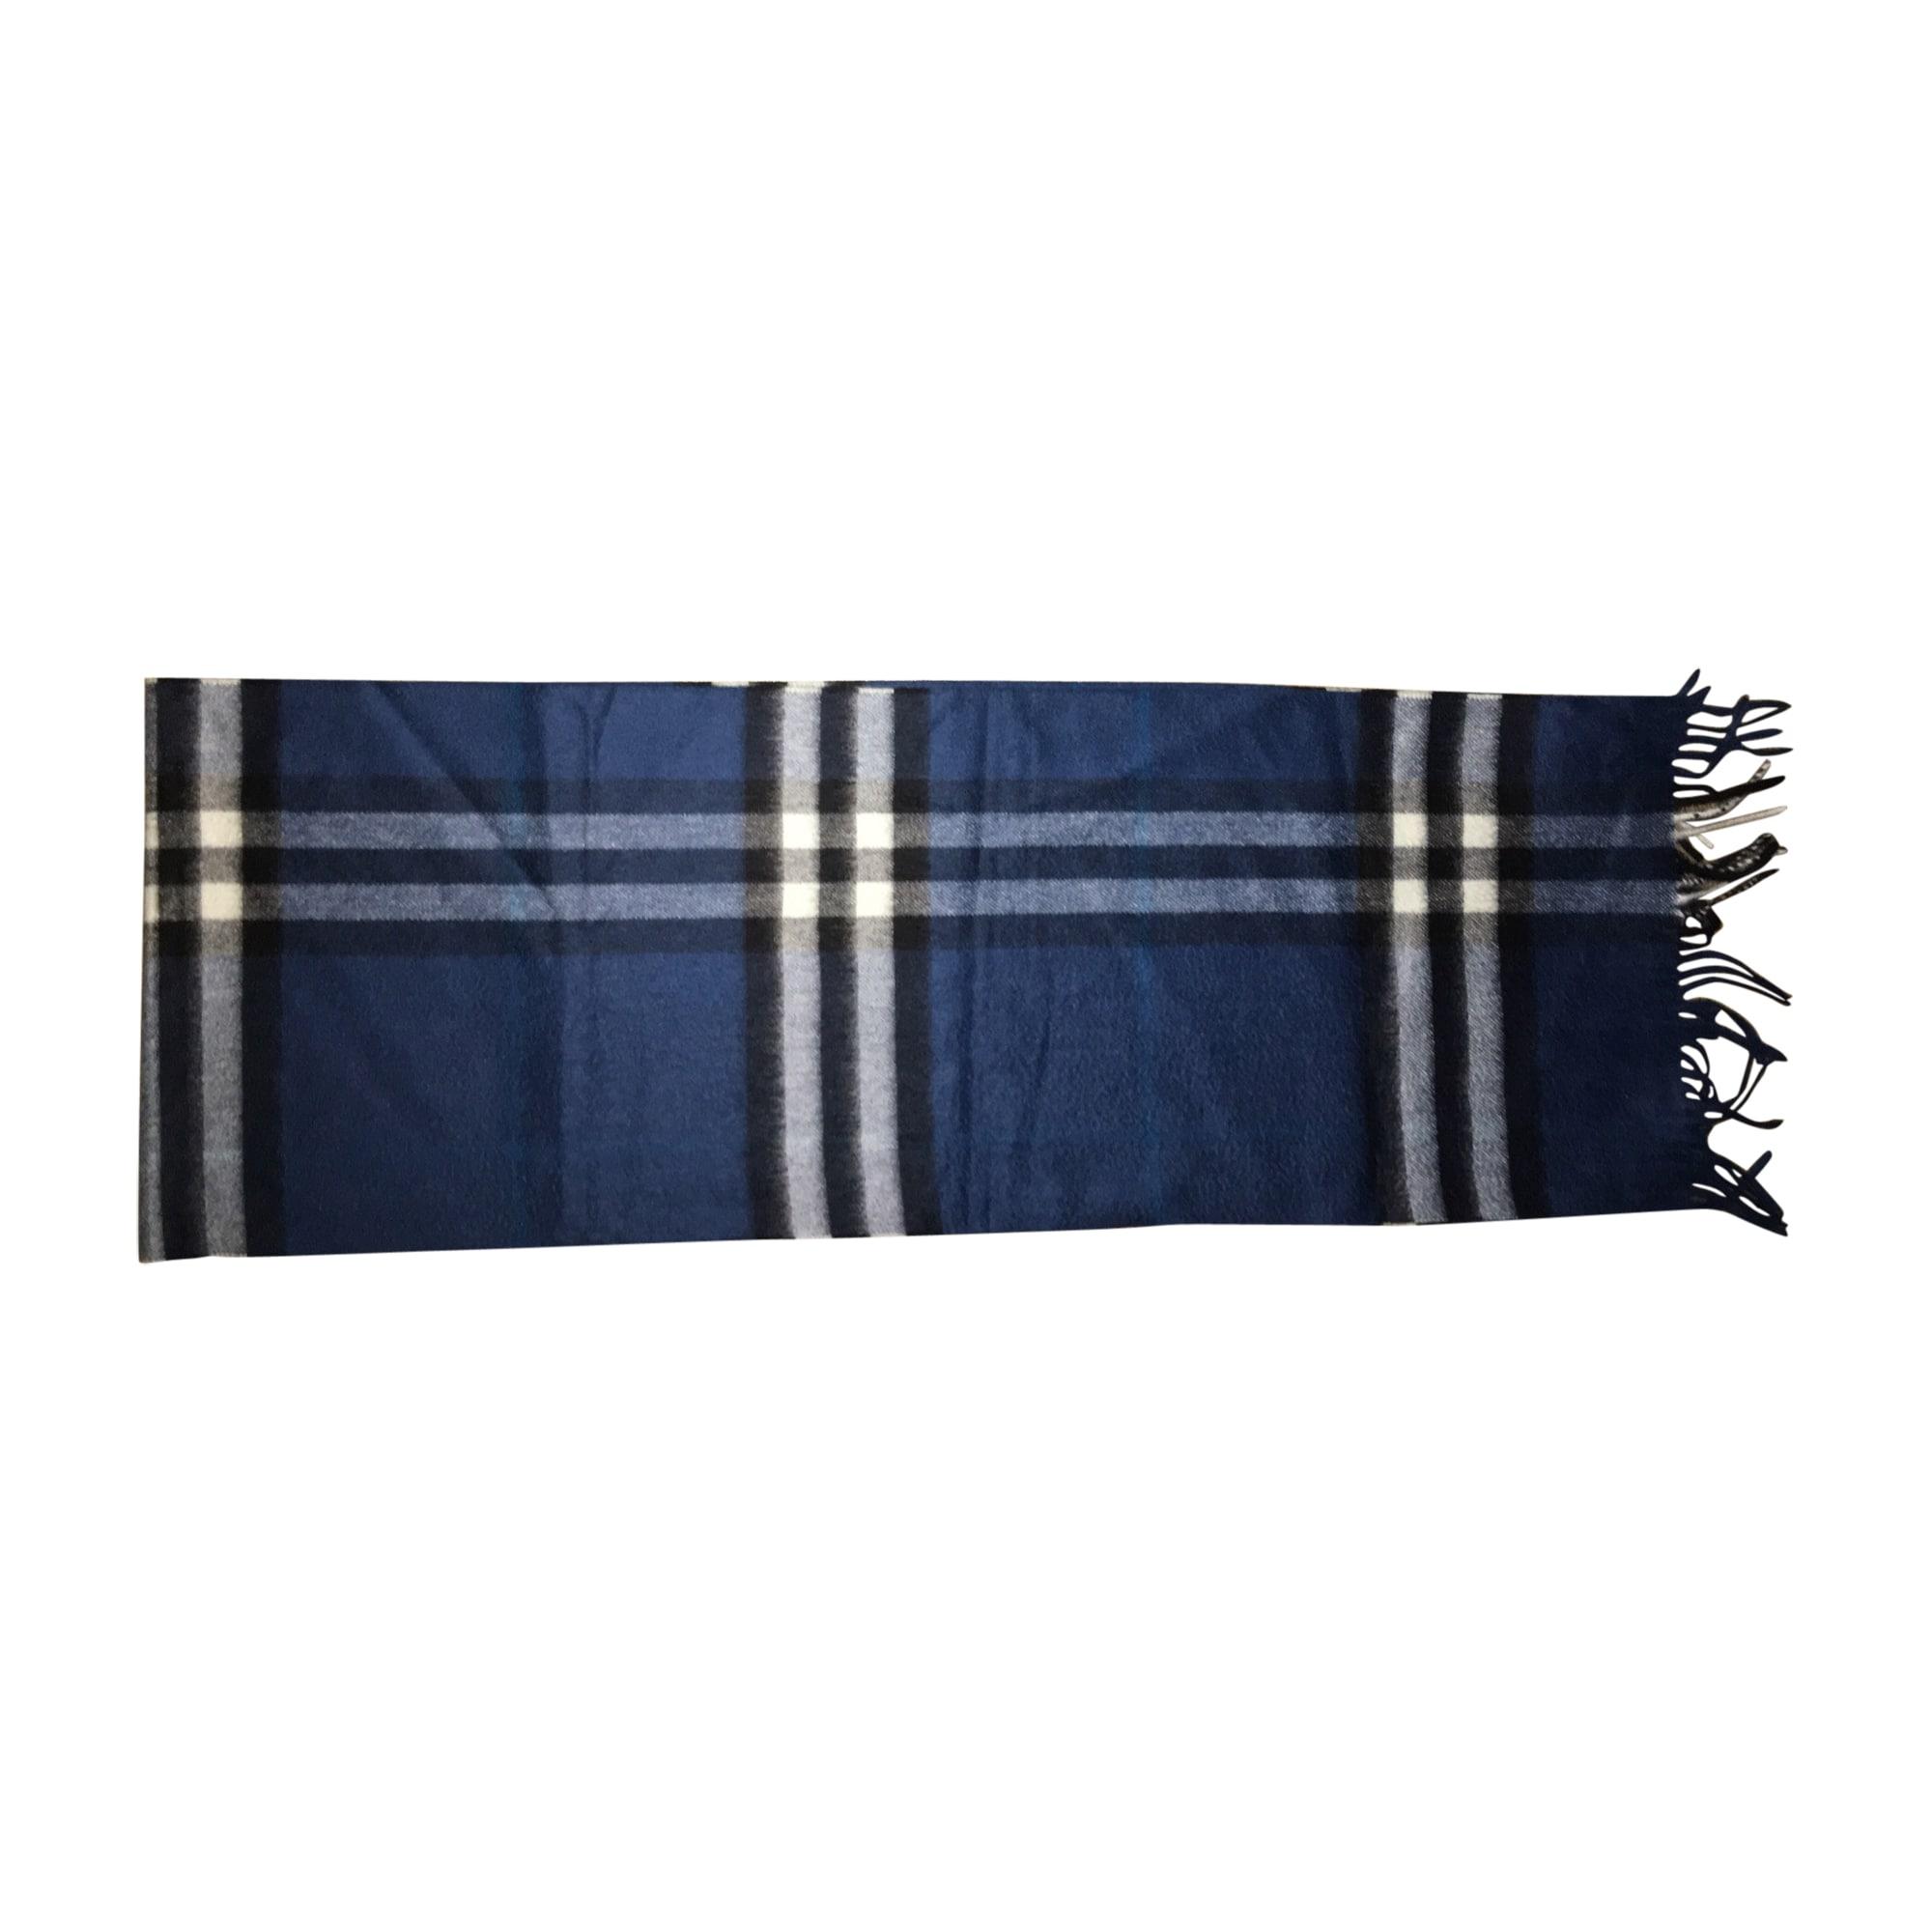 Echarpe BURBERRY bleu vendu par Priska 13 - 7470535 d766713b2b7